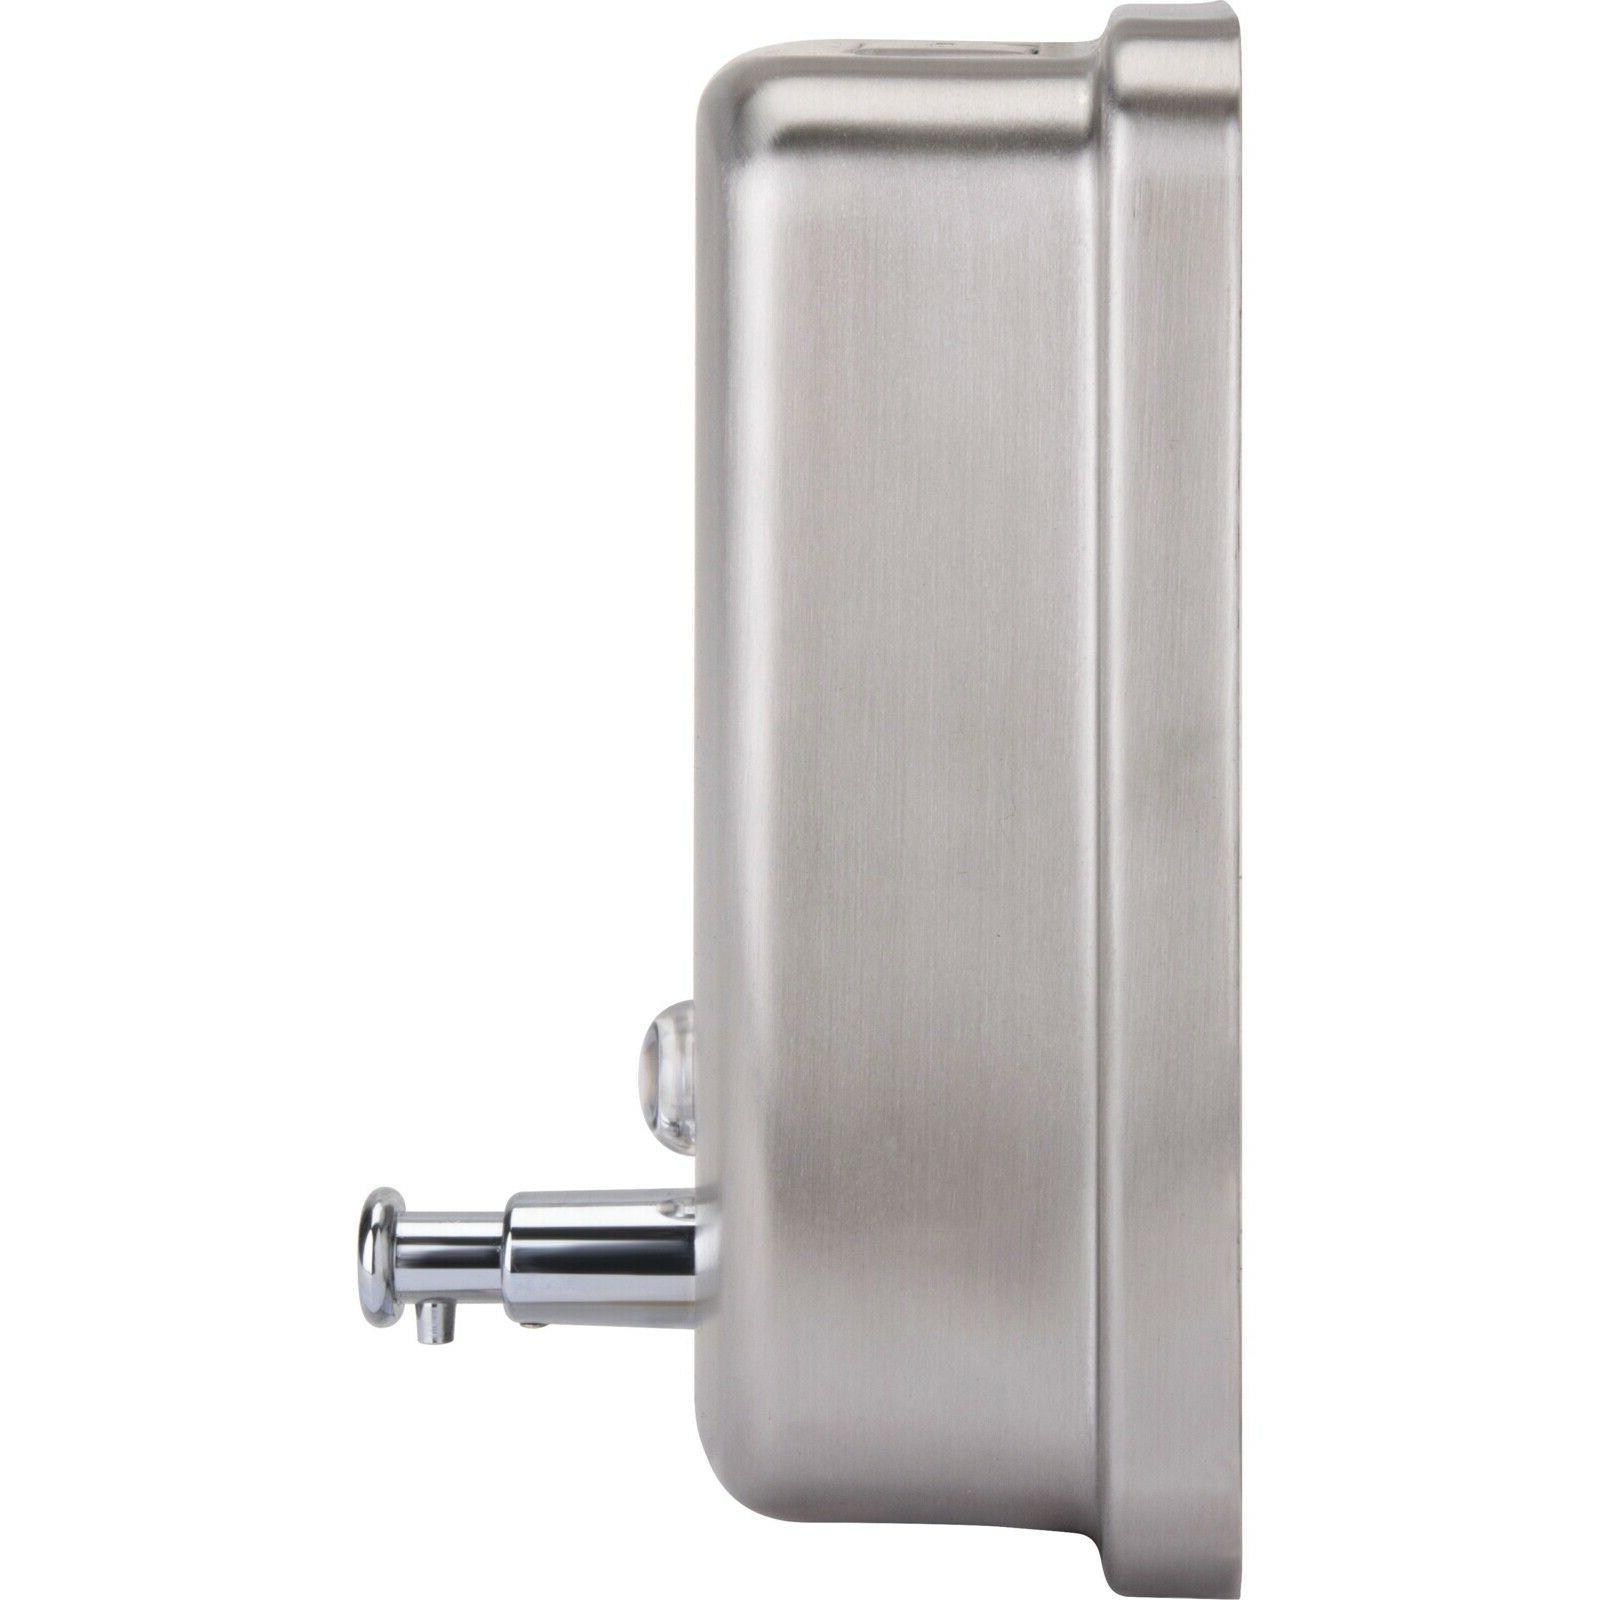 Genuine Steel Dispenser Manual